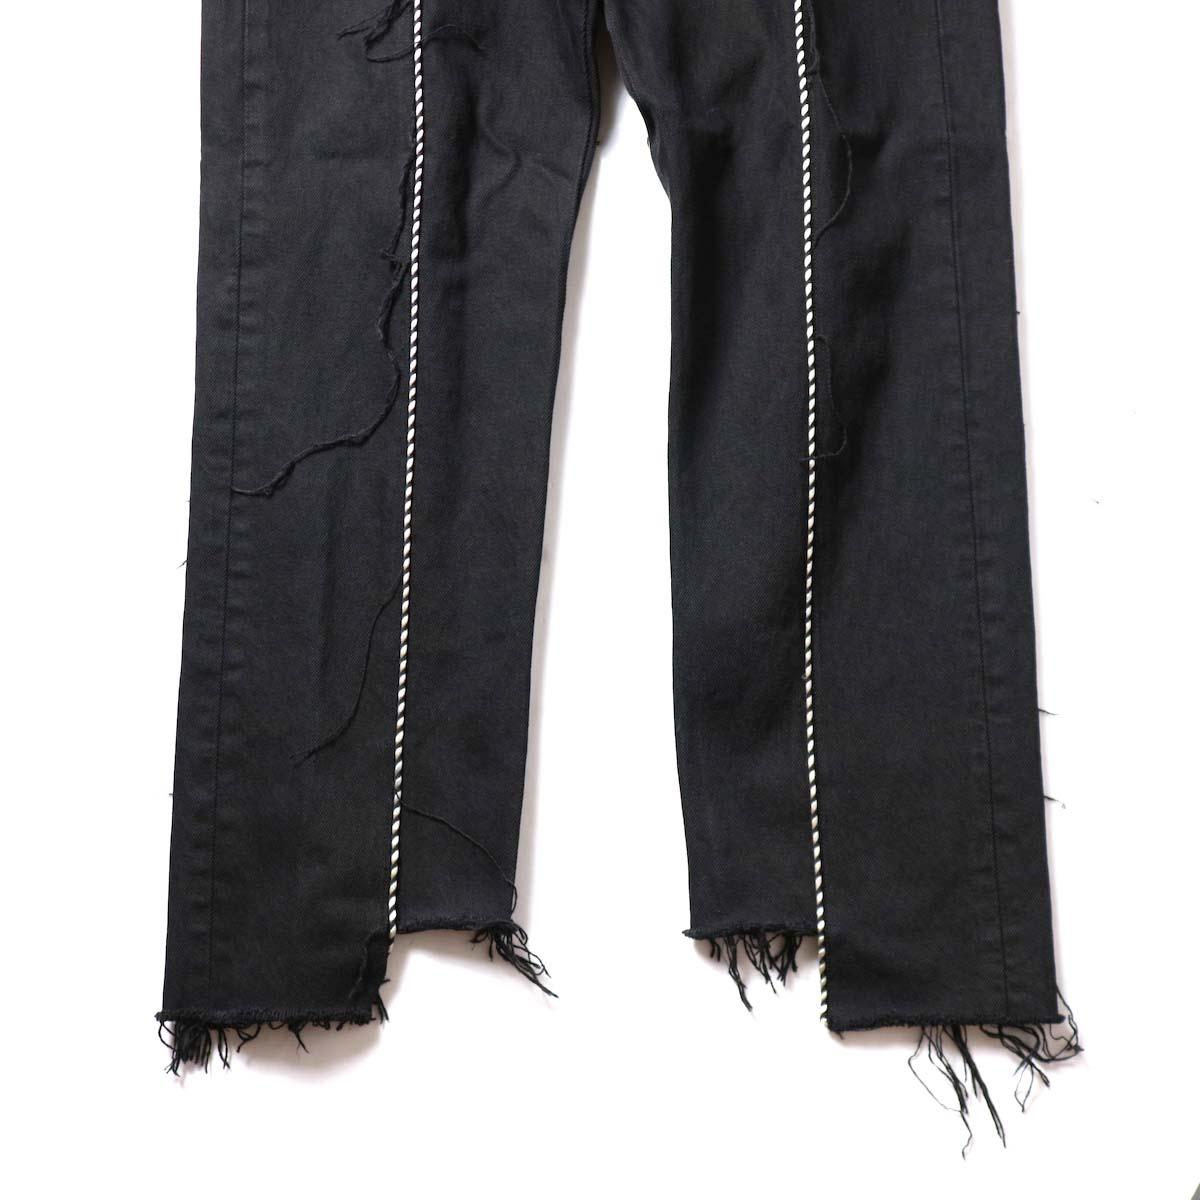 OLD PARK / Western Jeans Black (Msize-E)裾